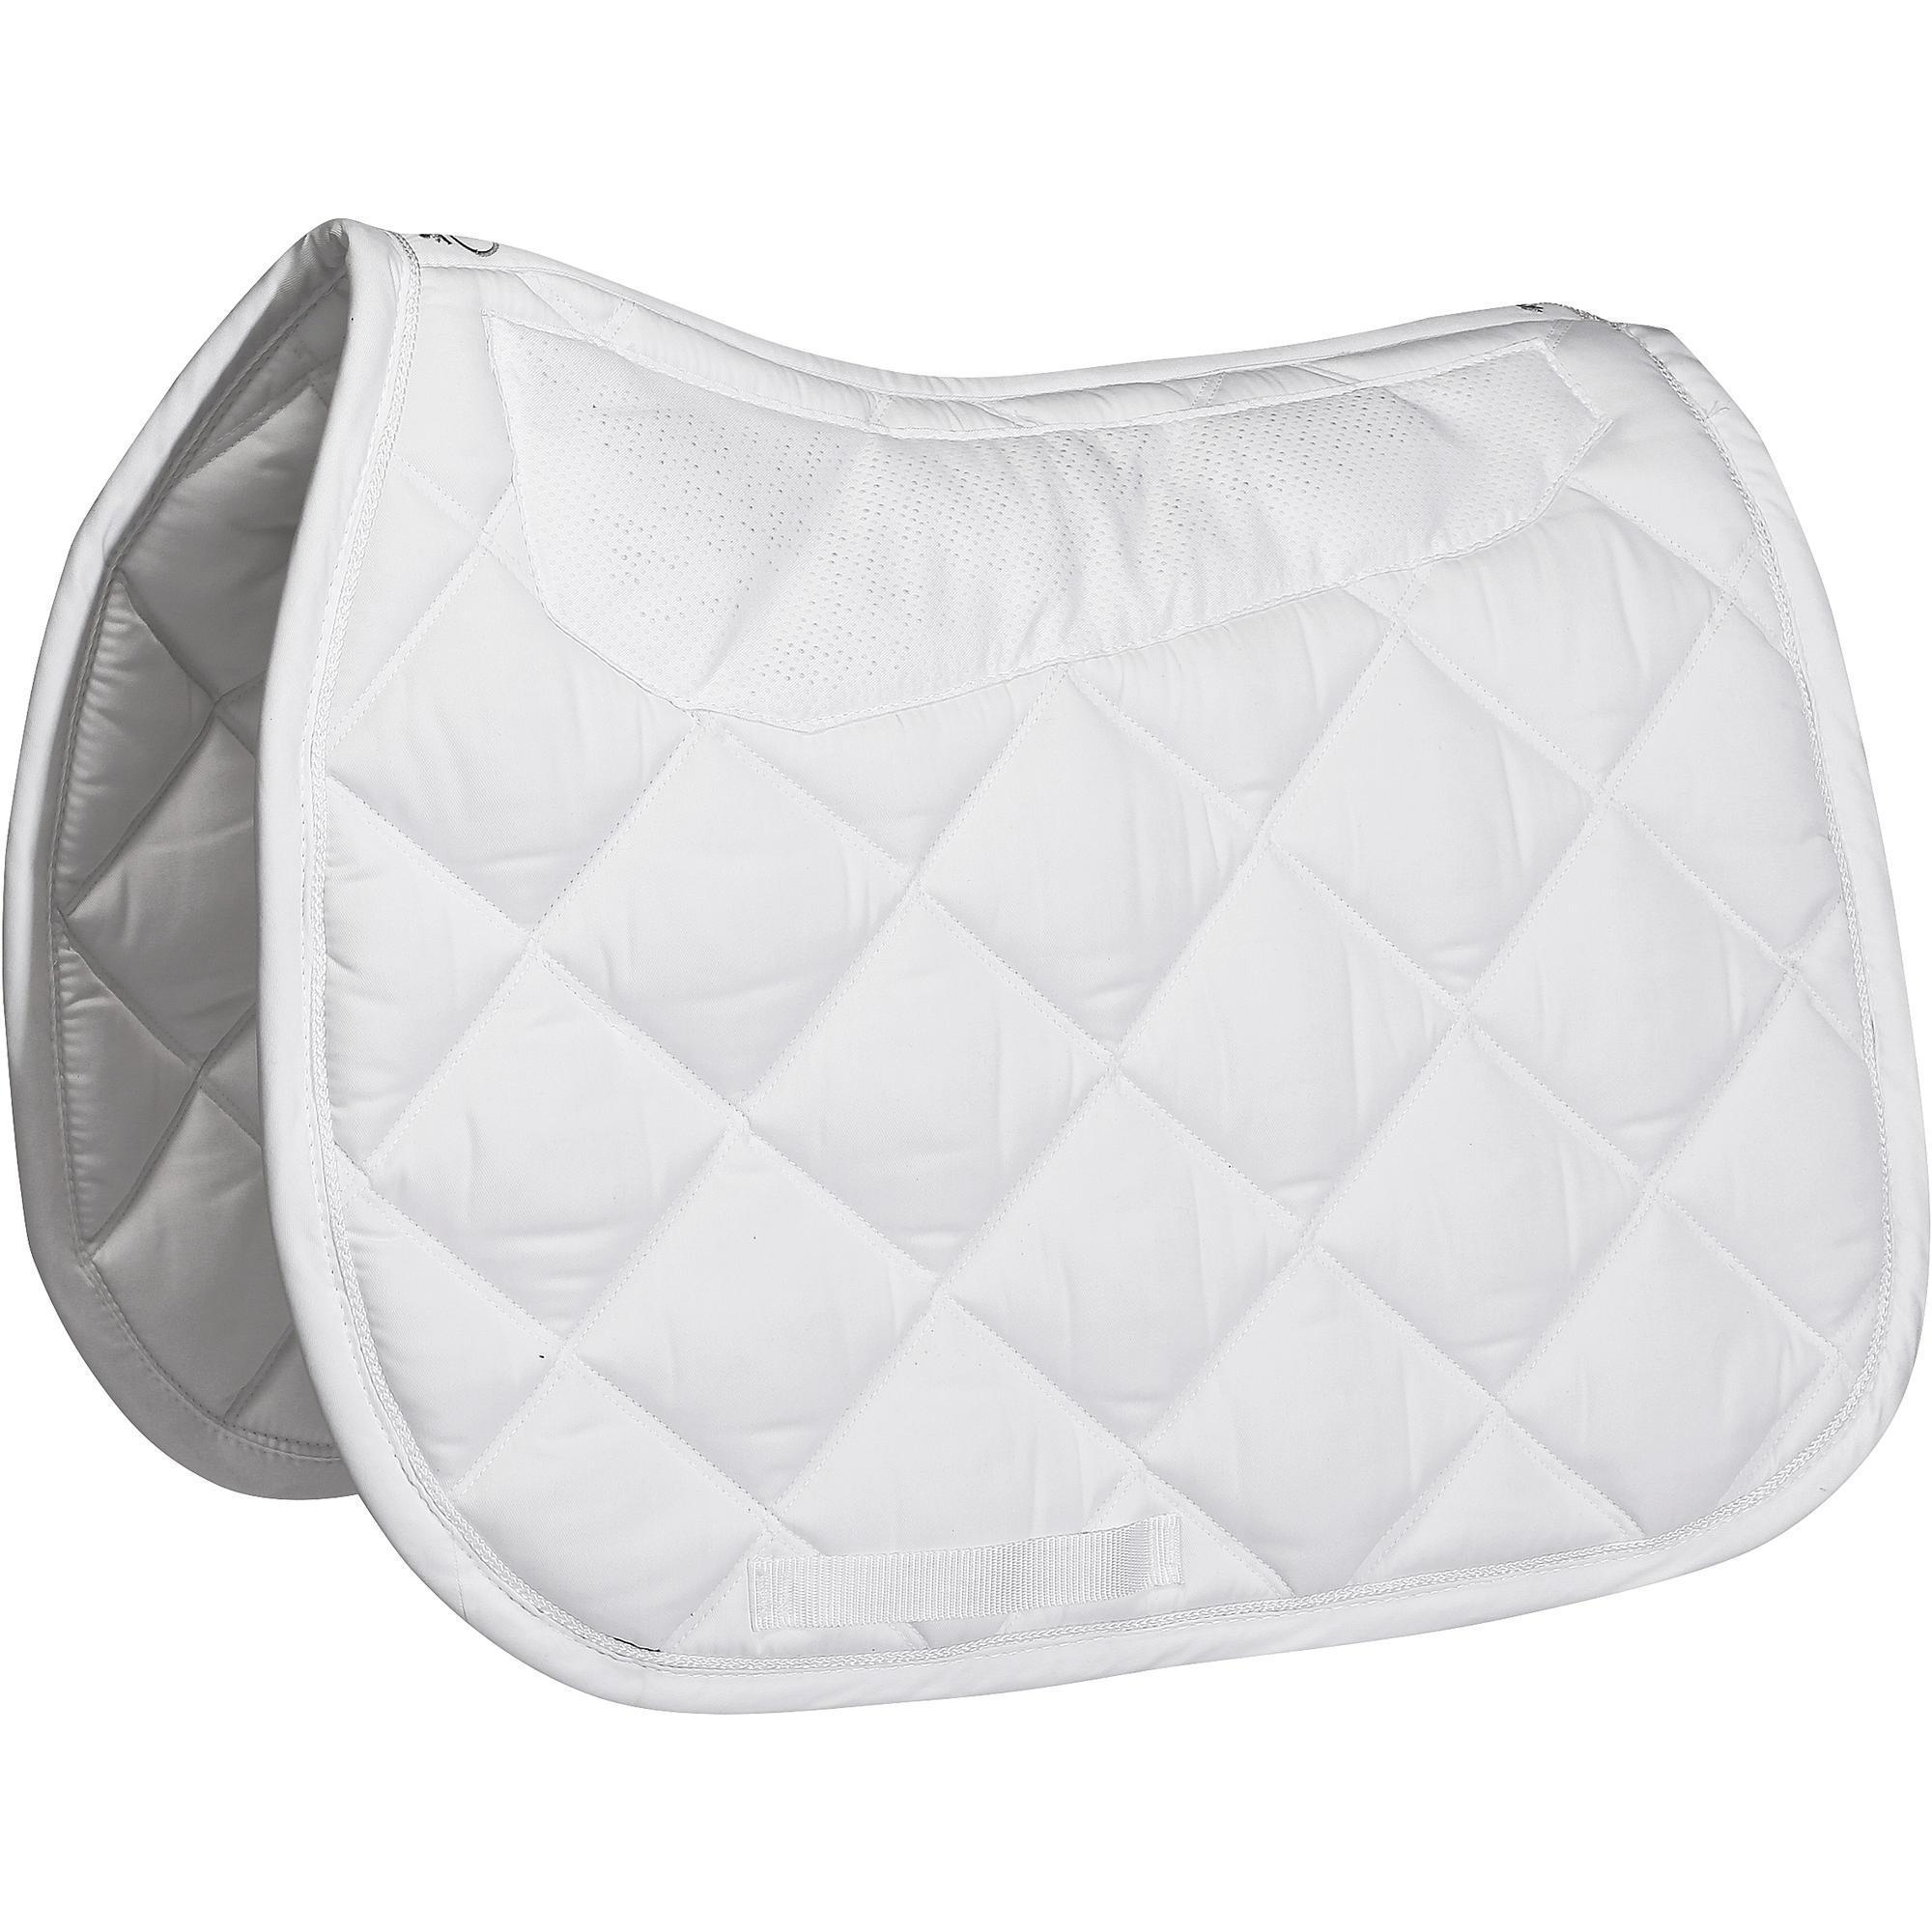 tapis de selle quitation cheval grippy blanc fouganza. Black Bedroom Furniture Sets. Home Design Ideas